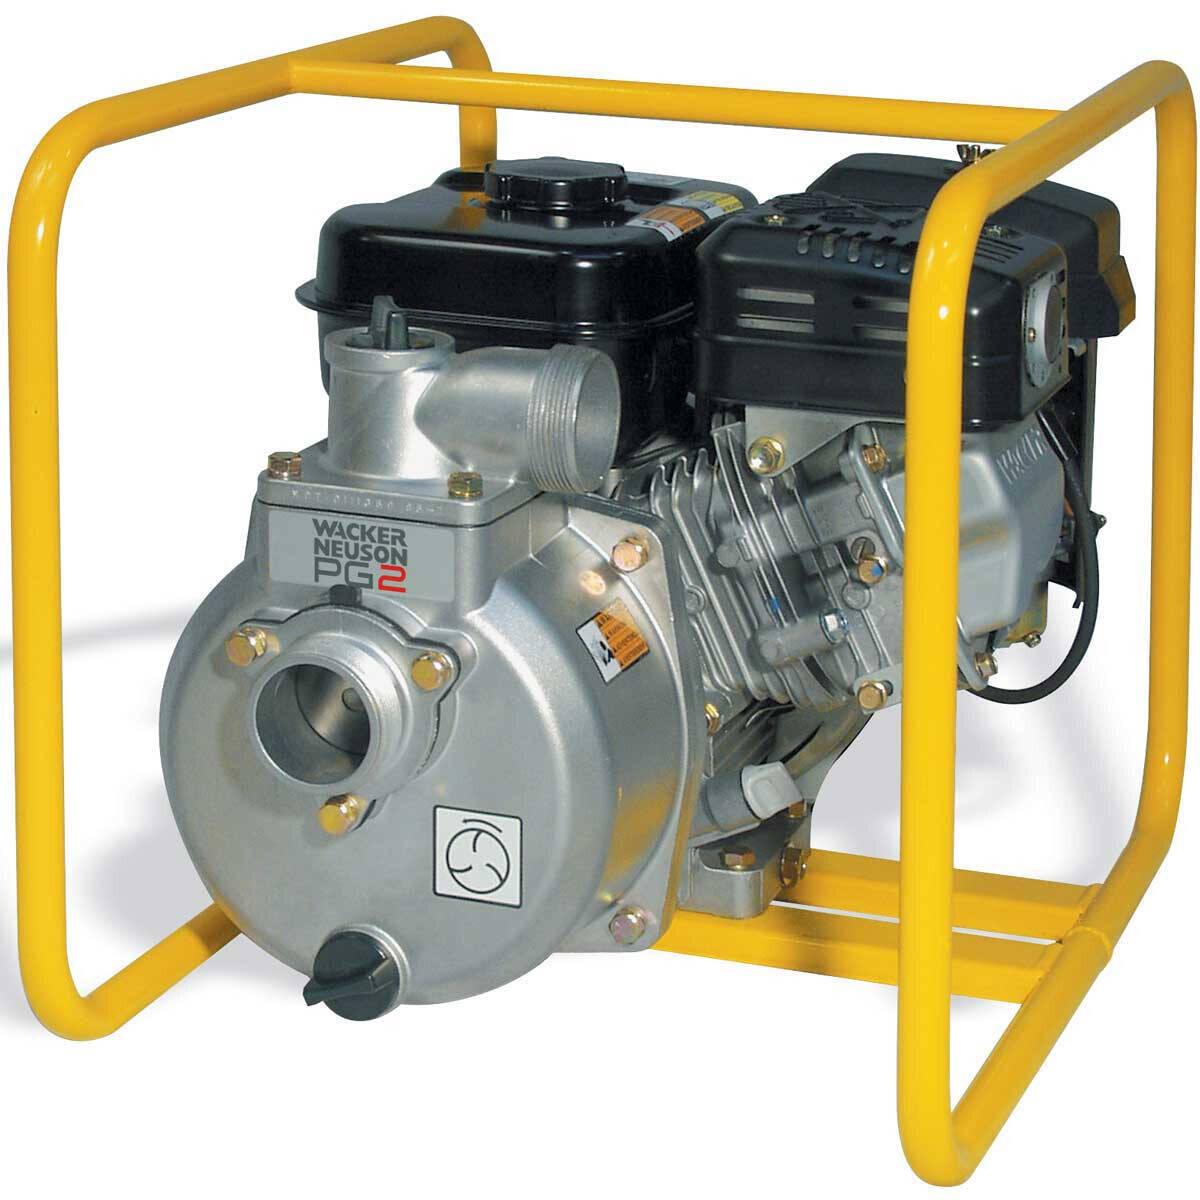 Wacker Neuson PG2A Centrifugal Pump